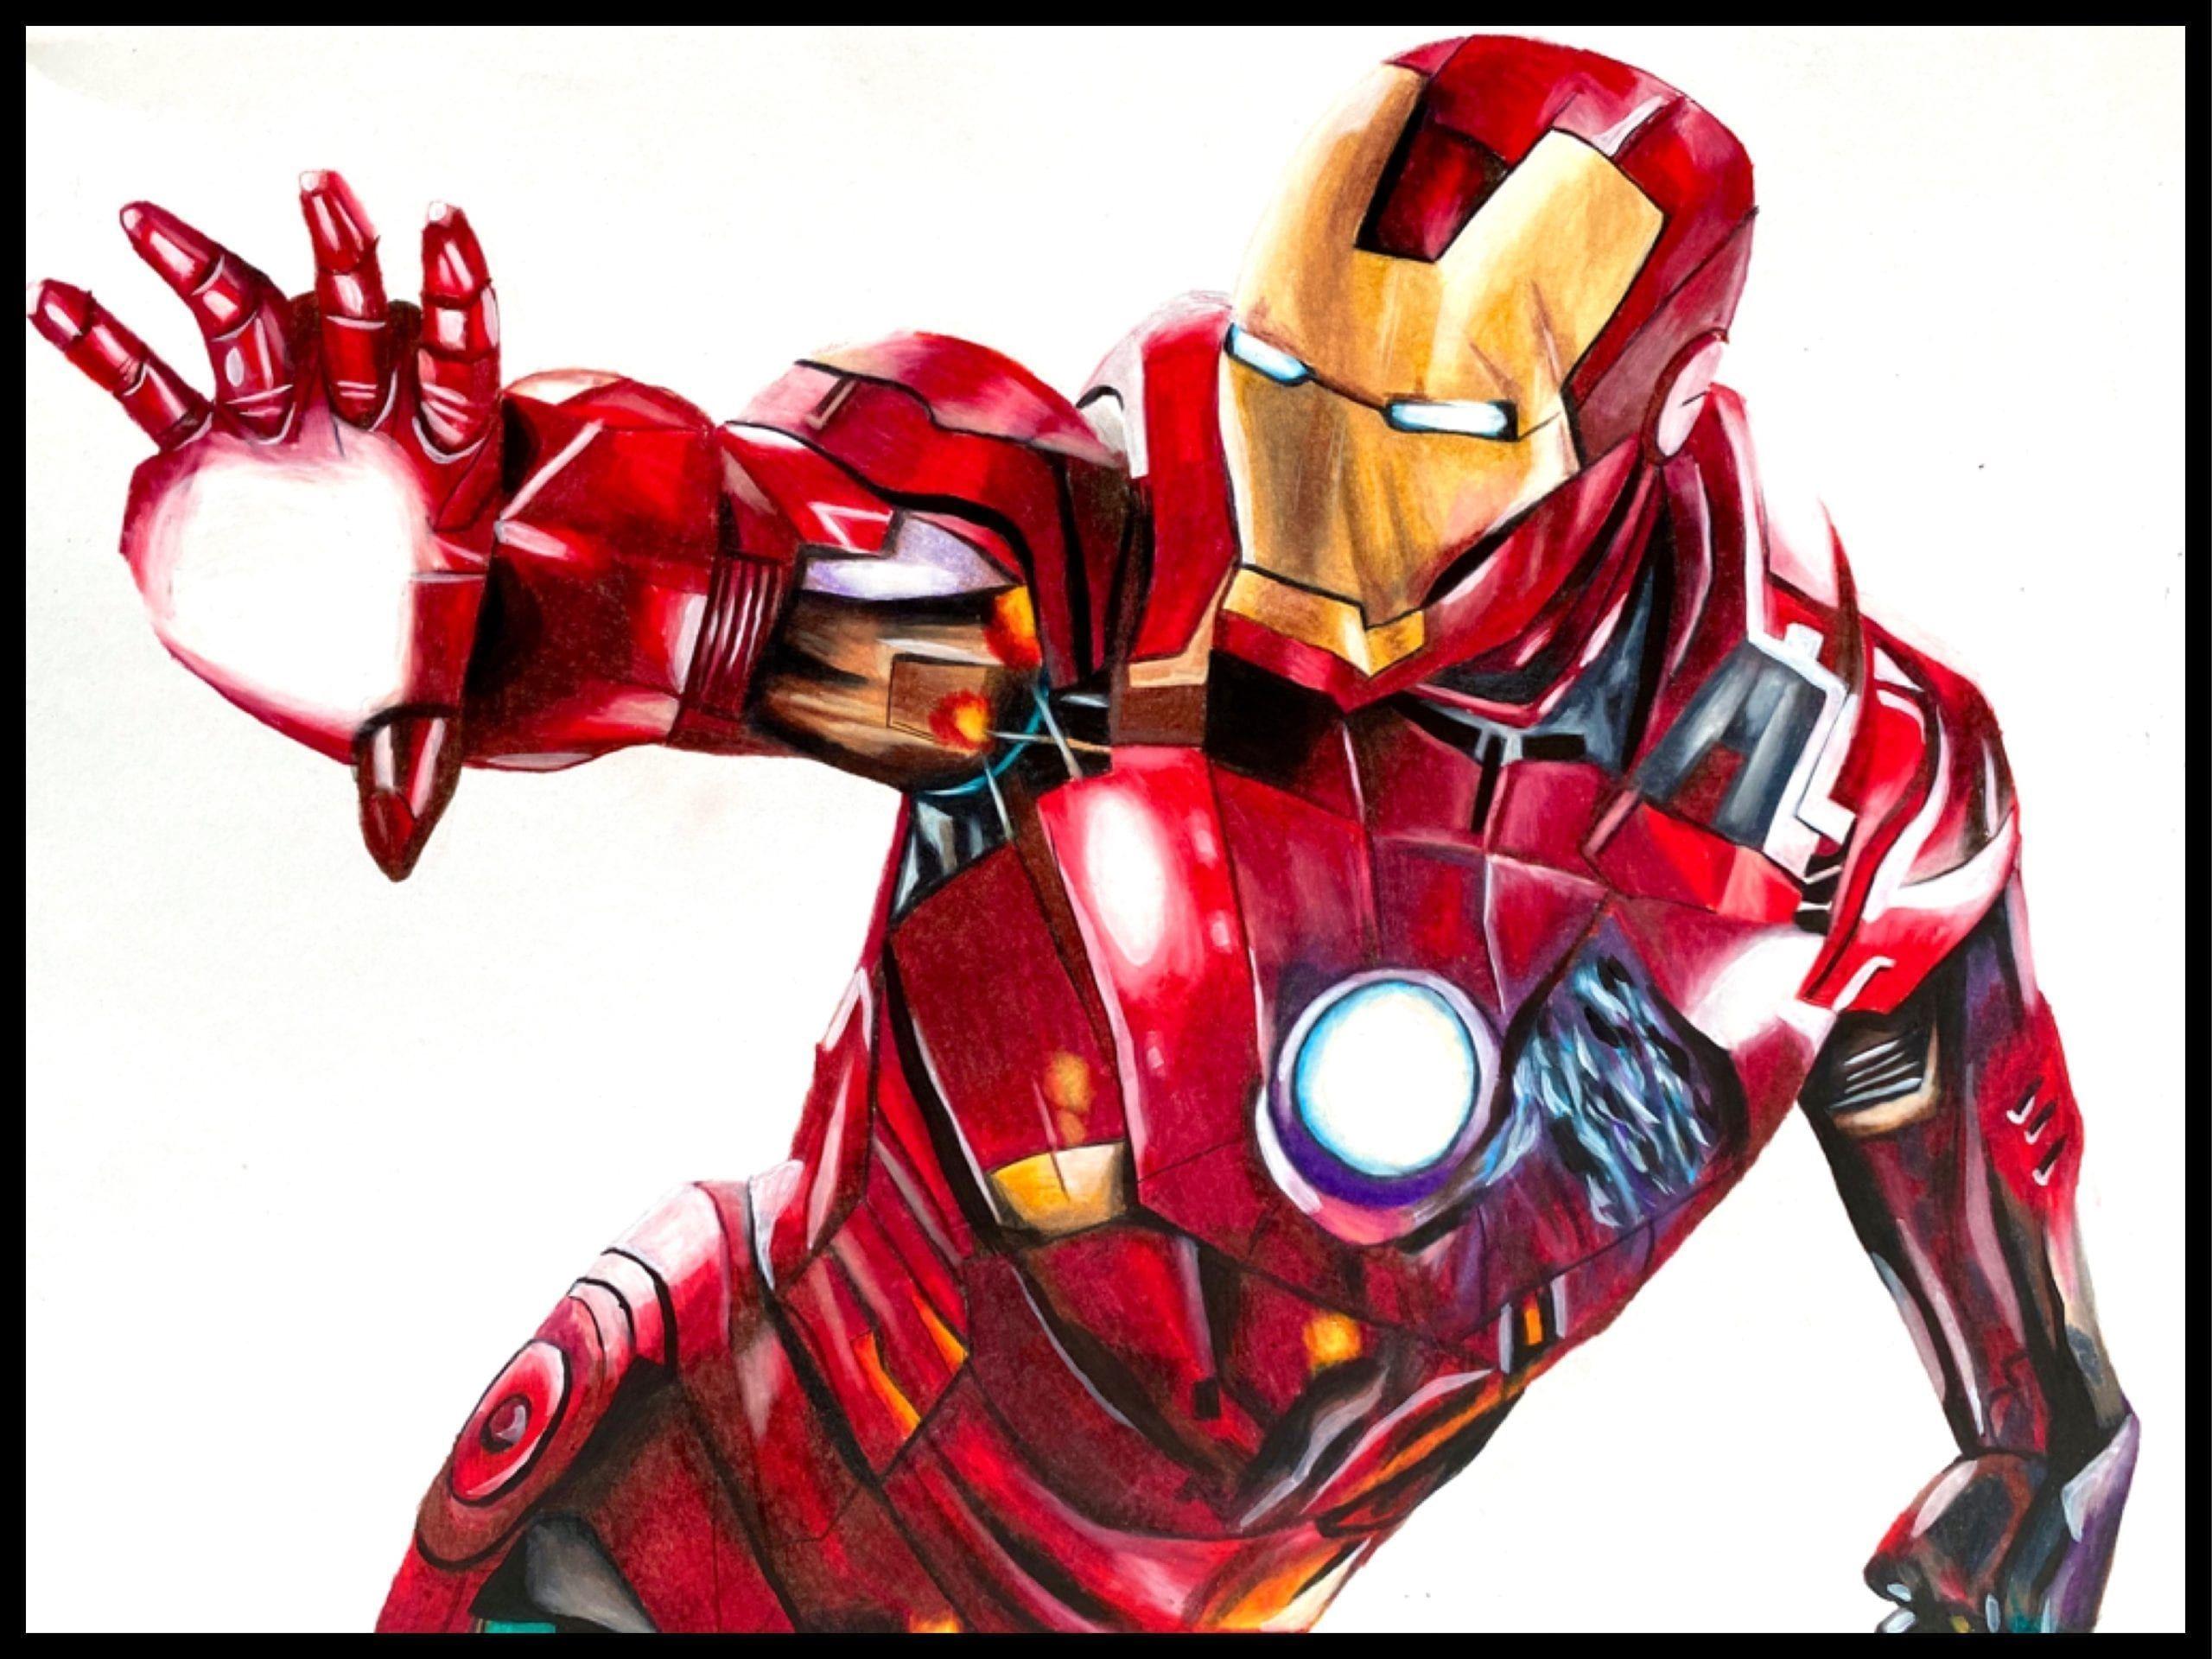 Iron Man Iron Man Drawing Iron Man Iron Man Symbol